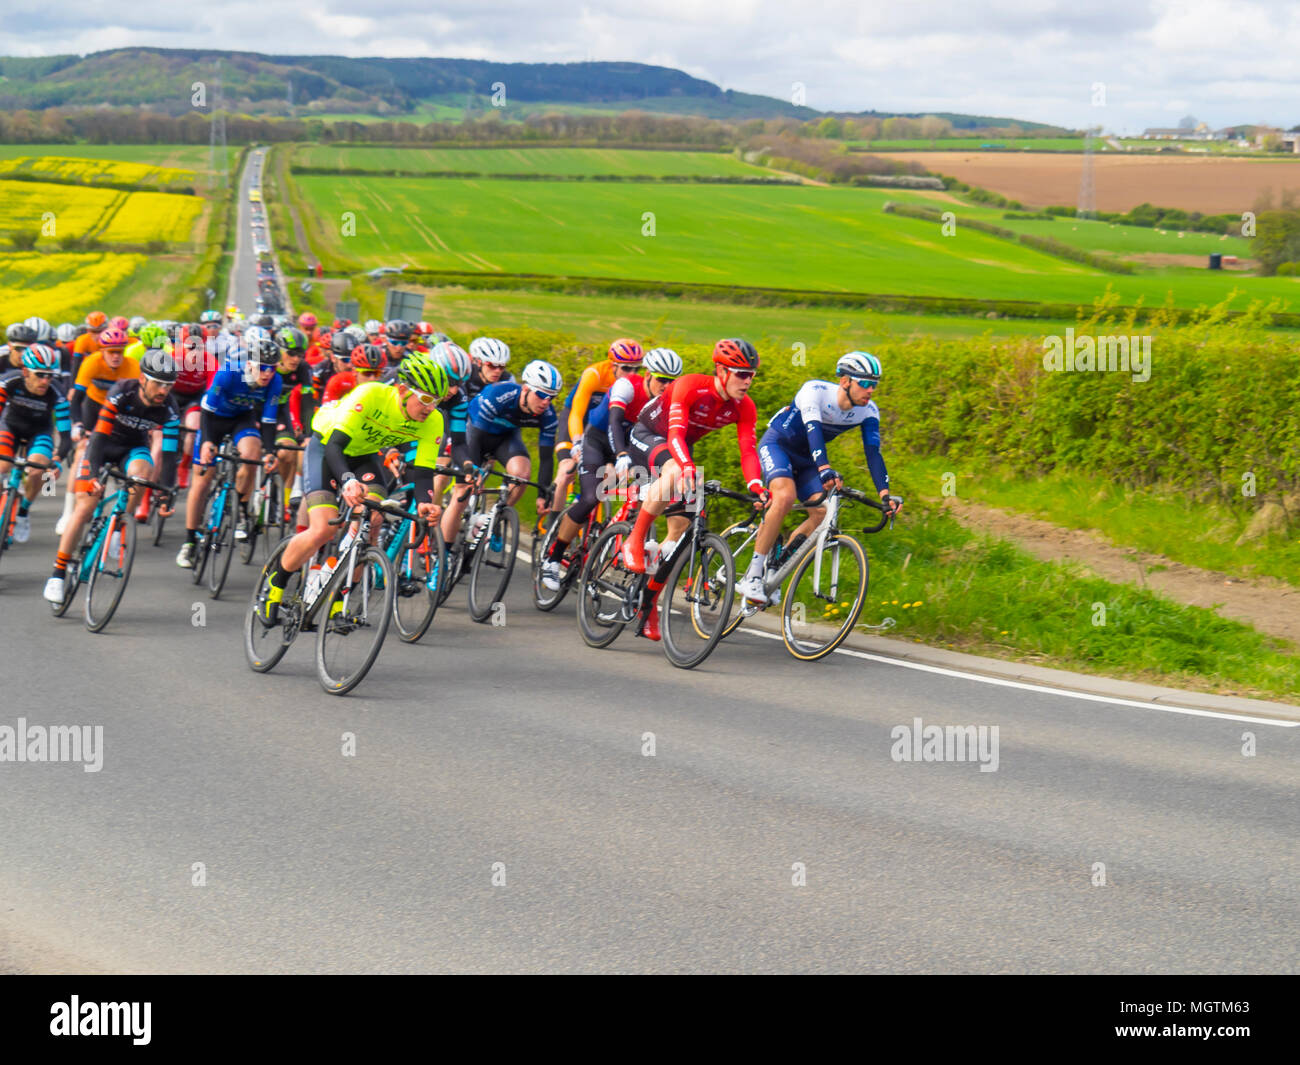 Sport News Today Imágenes De Stock & Sport News Today Fotos De Stock ...